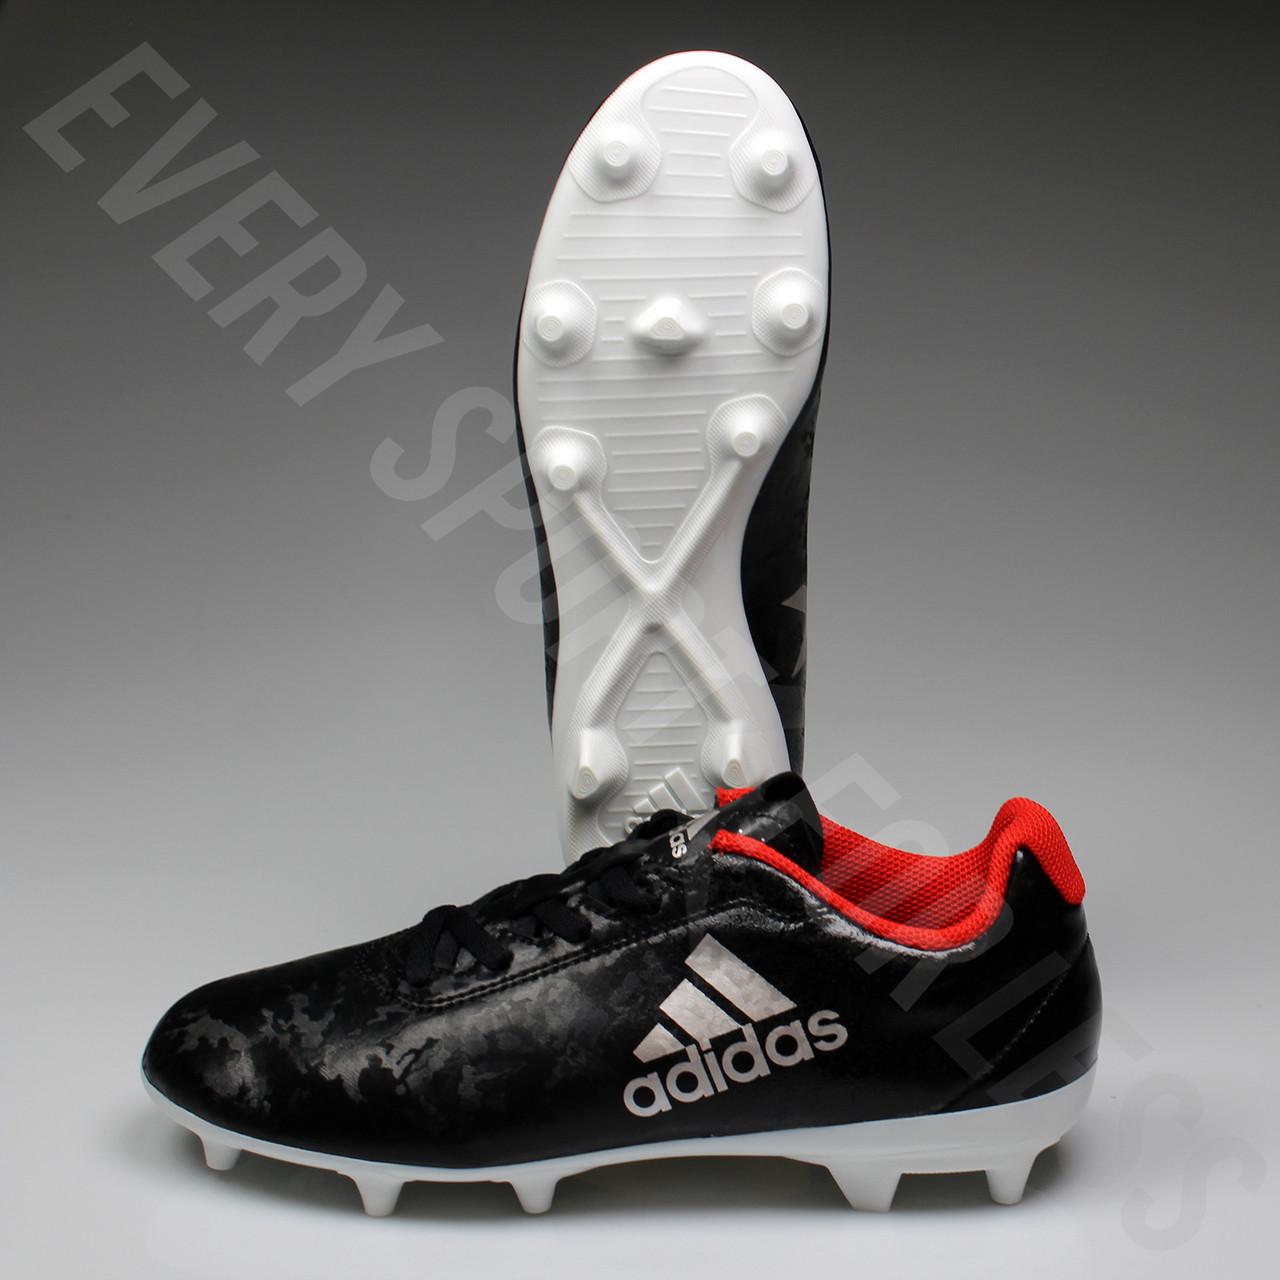 221f926d4410 ... Adidas X 17.4 FG Women s Soccer Cleats BA8564 - Black